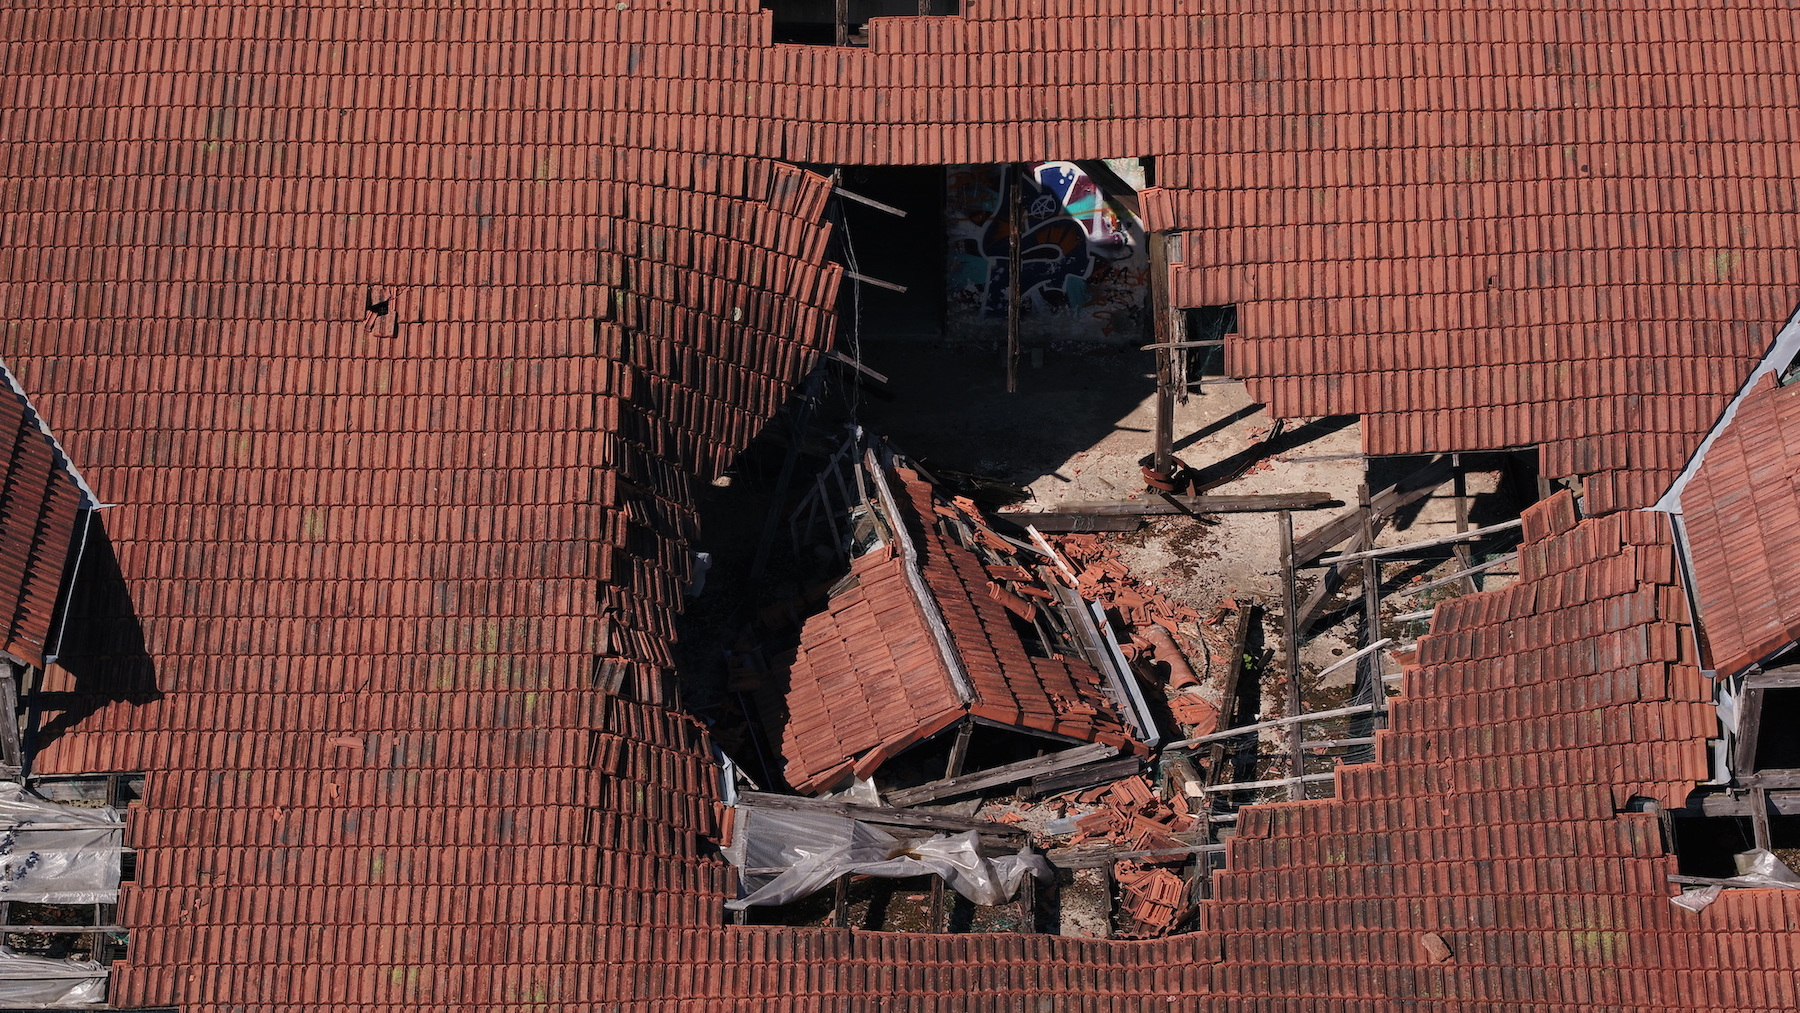 Dachinspektion per Drohne